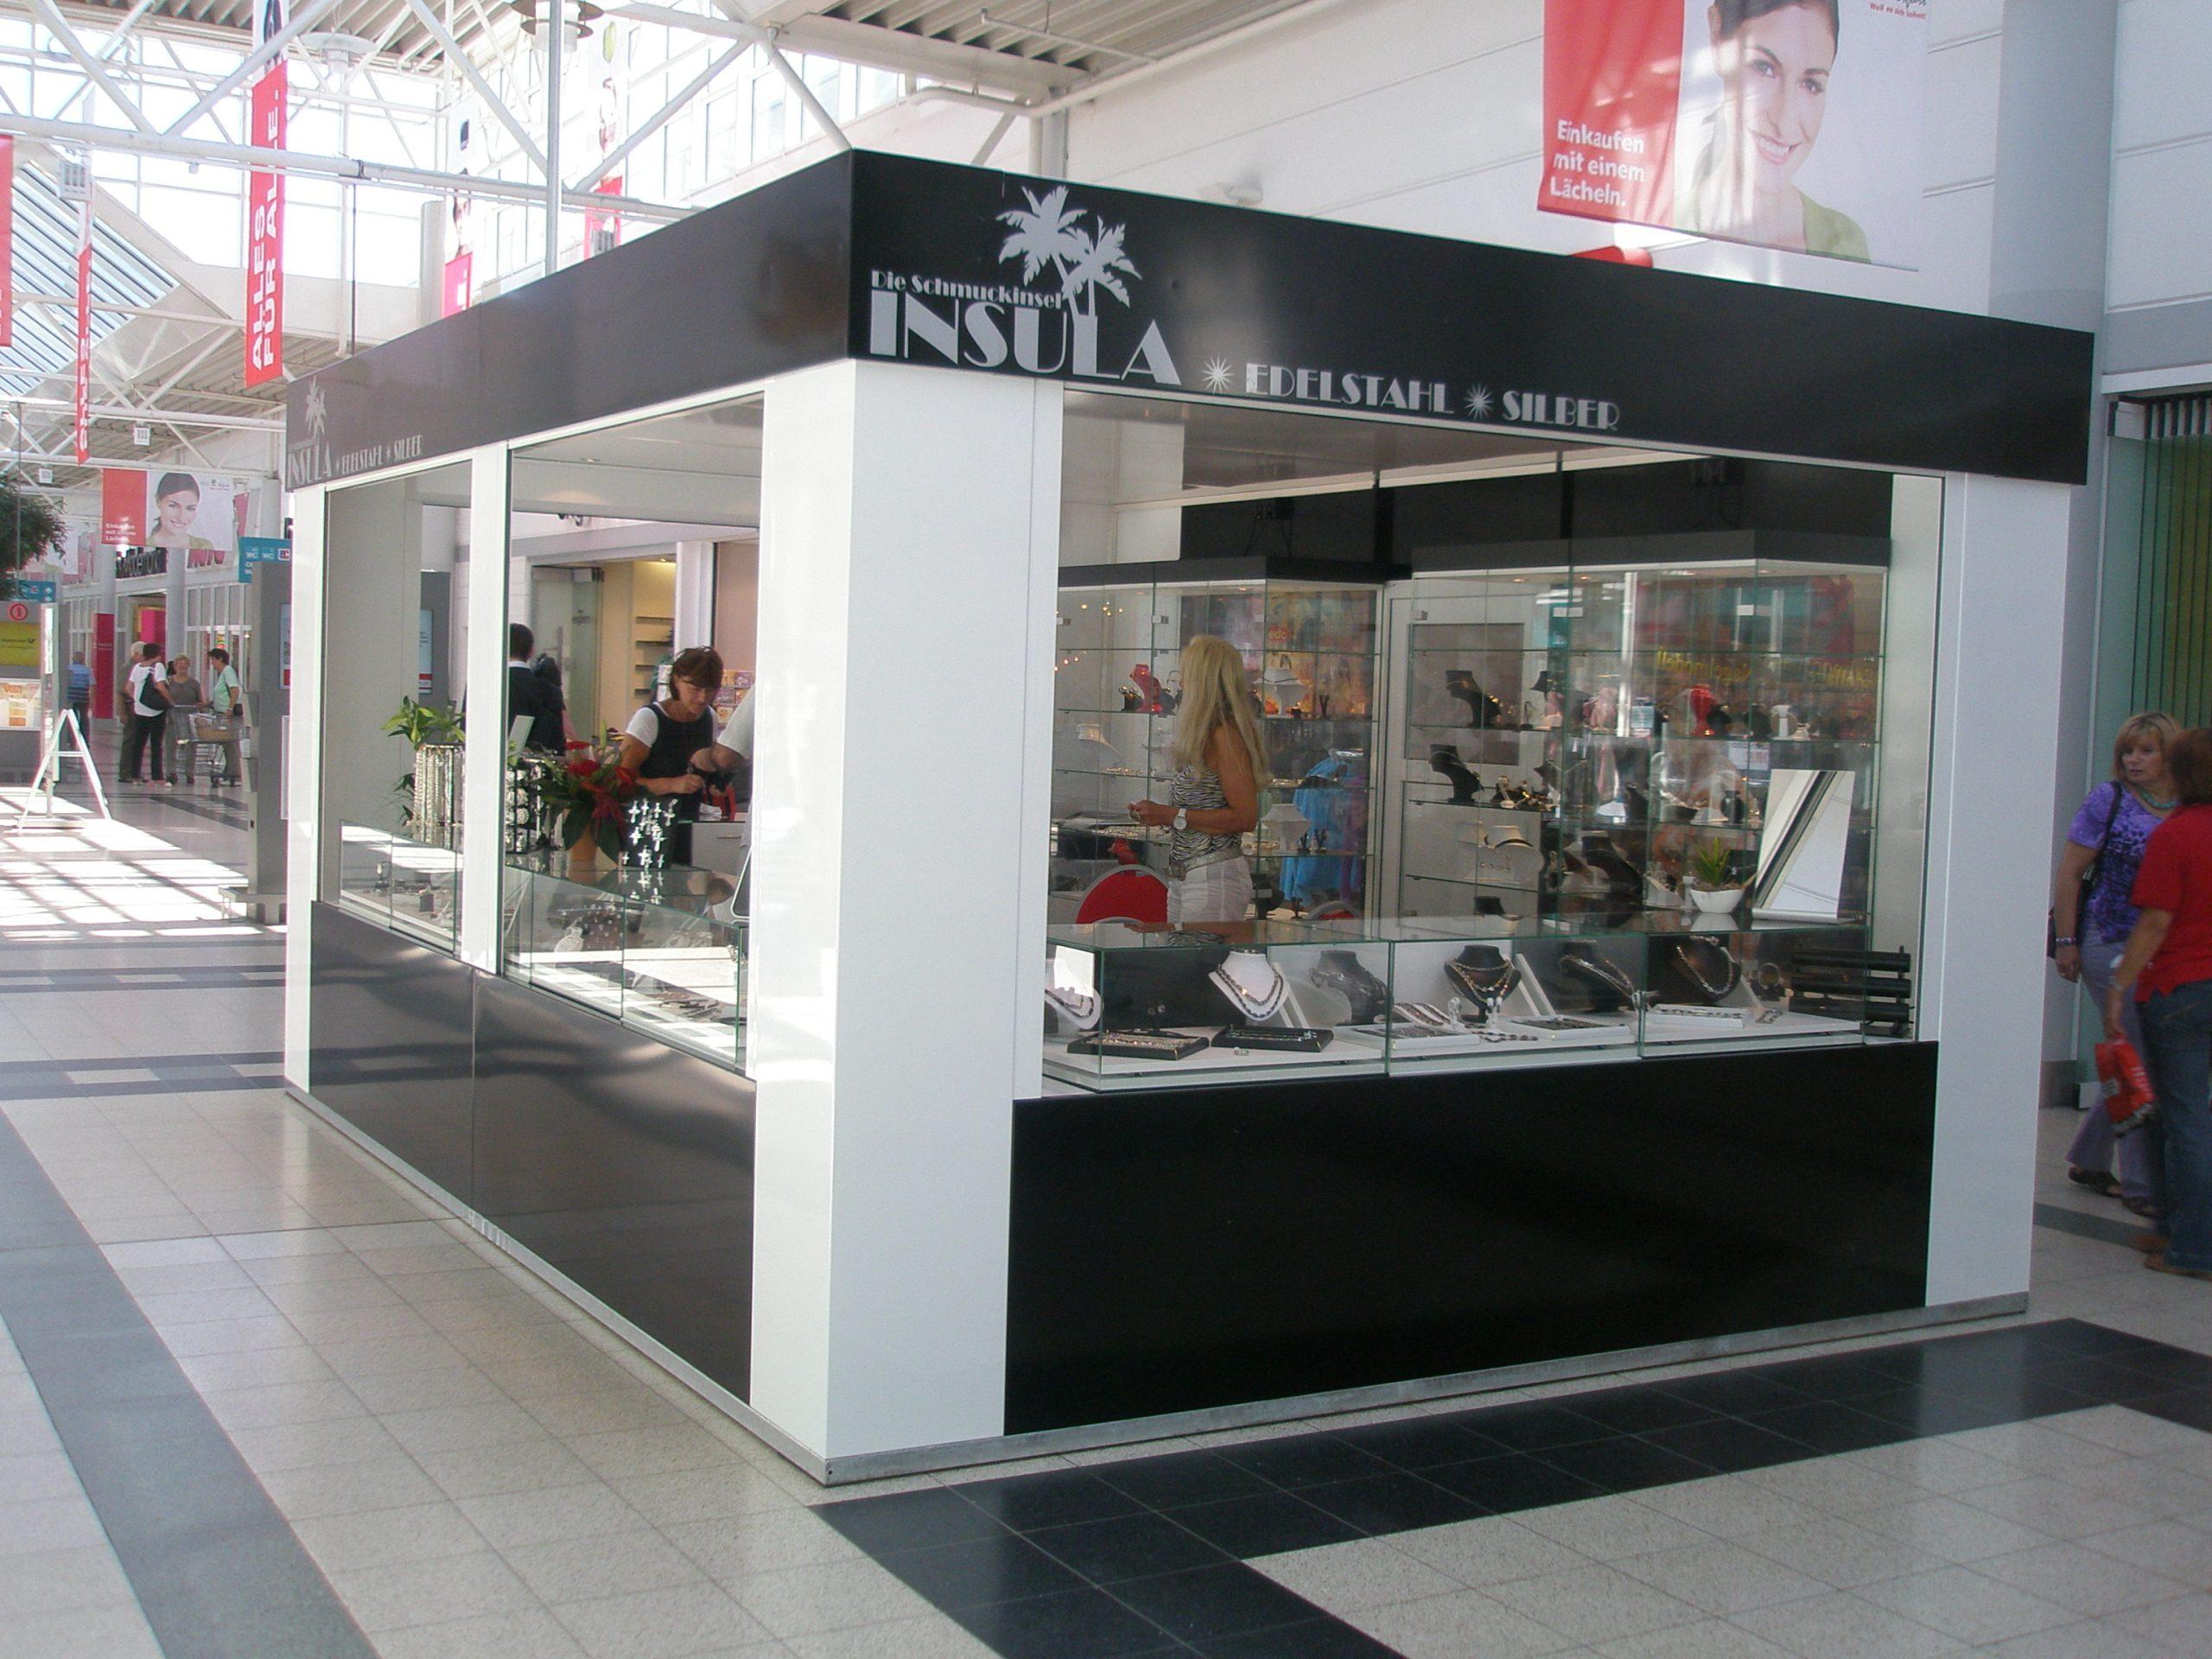 Schmuck Merchandise Kiosk Pavillon Mall Verkaufsstand Einkaufszentrum Indoor Cube